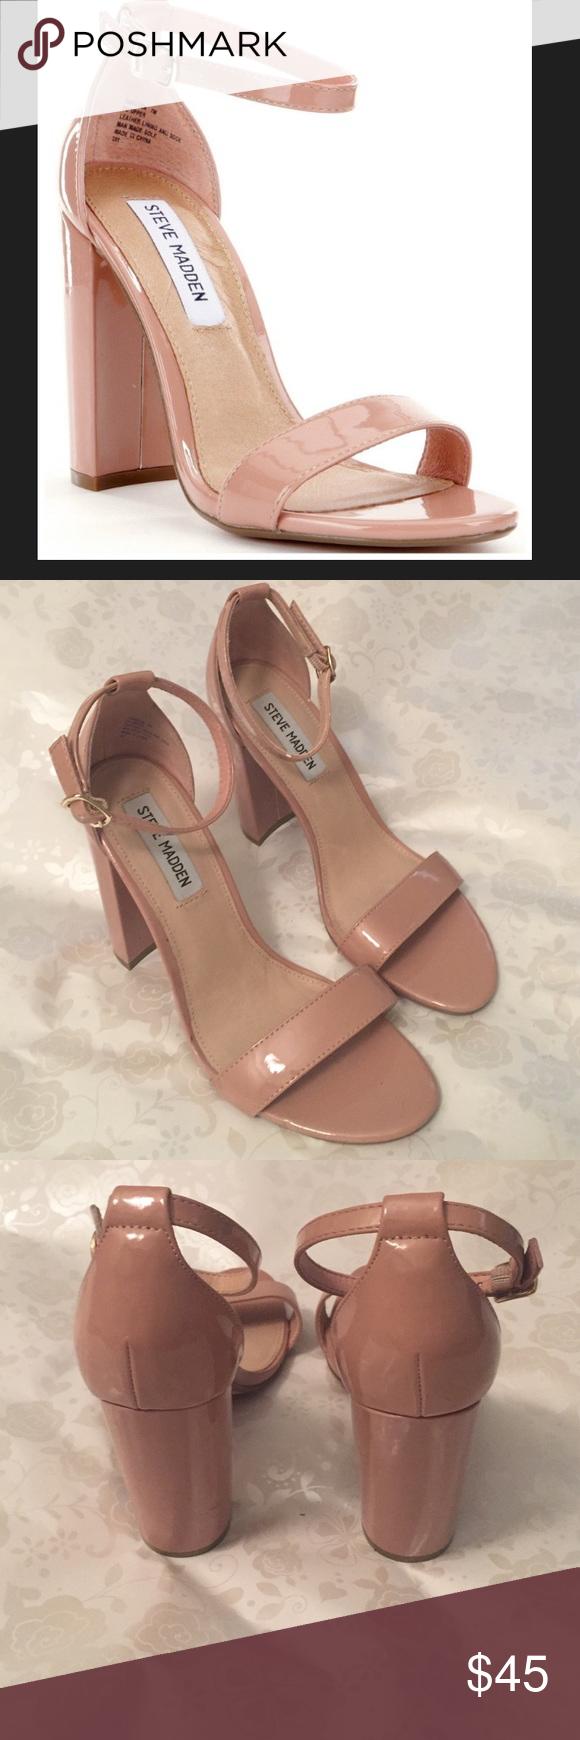 ca8ad7b17c7 Steve Madden Carrson Block Heel Sandals Blush patent leather block heel  with tasteful ankle strap. Worn once. Steve Madden Shoes Heels